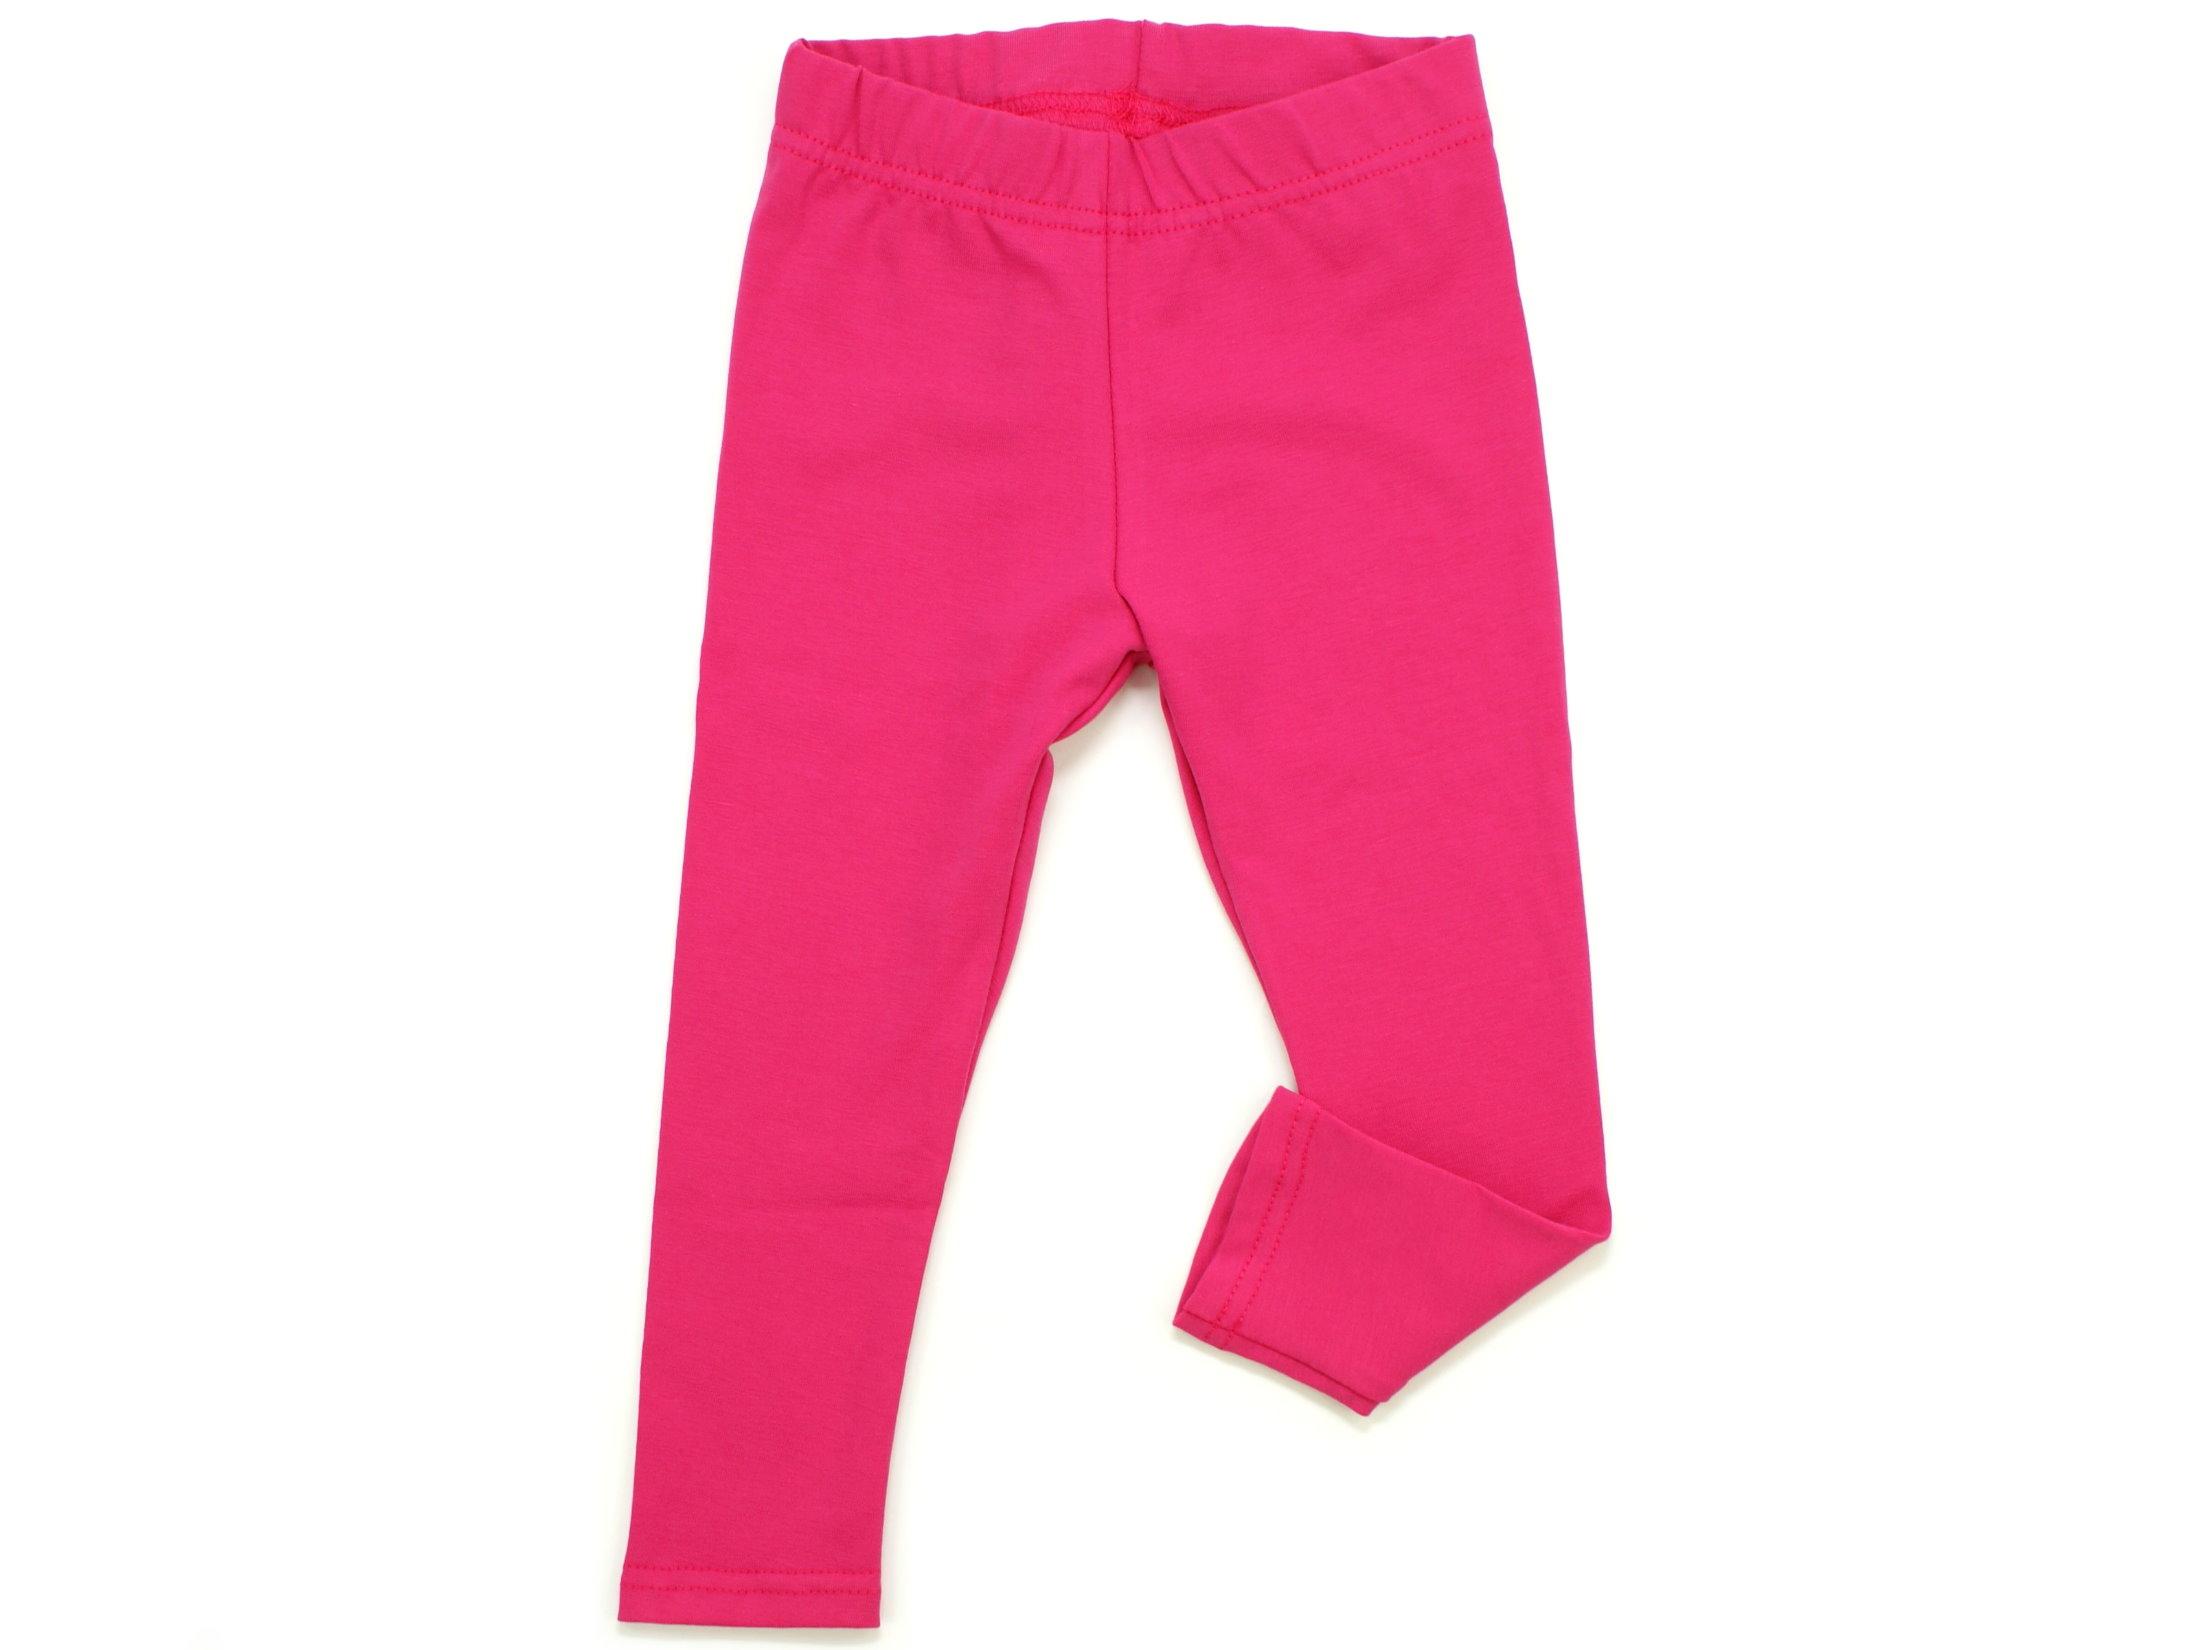 Kinder Leggings uni pink